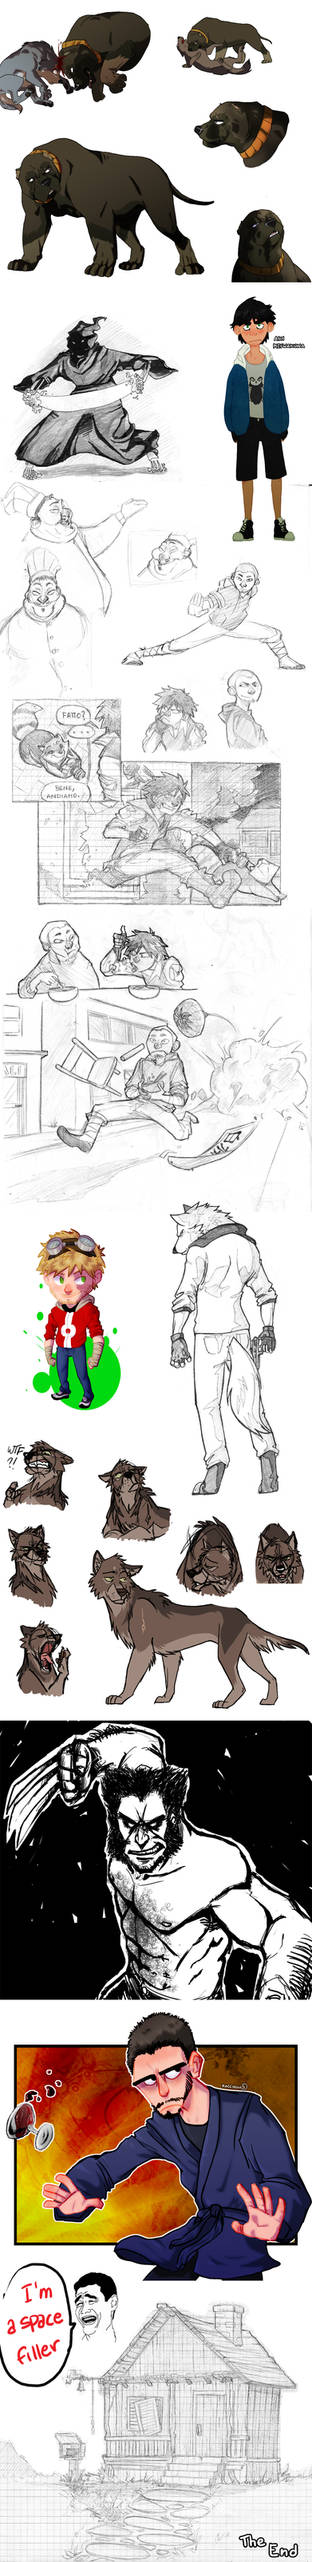 Sketch dump 3 by Raccoon5